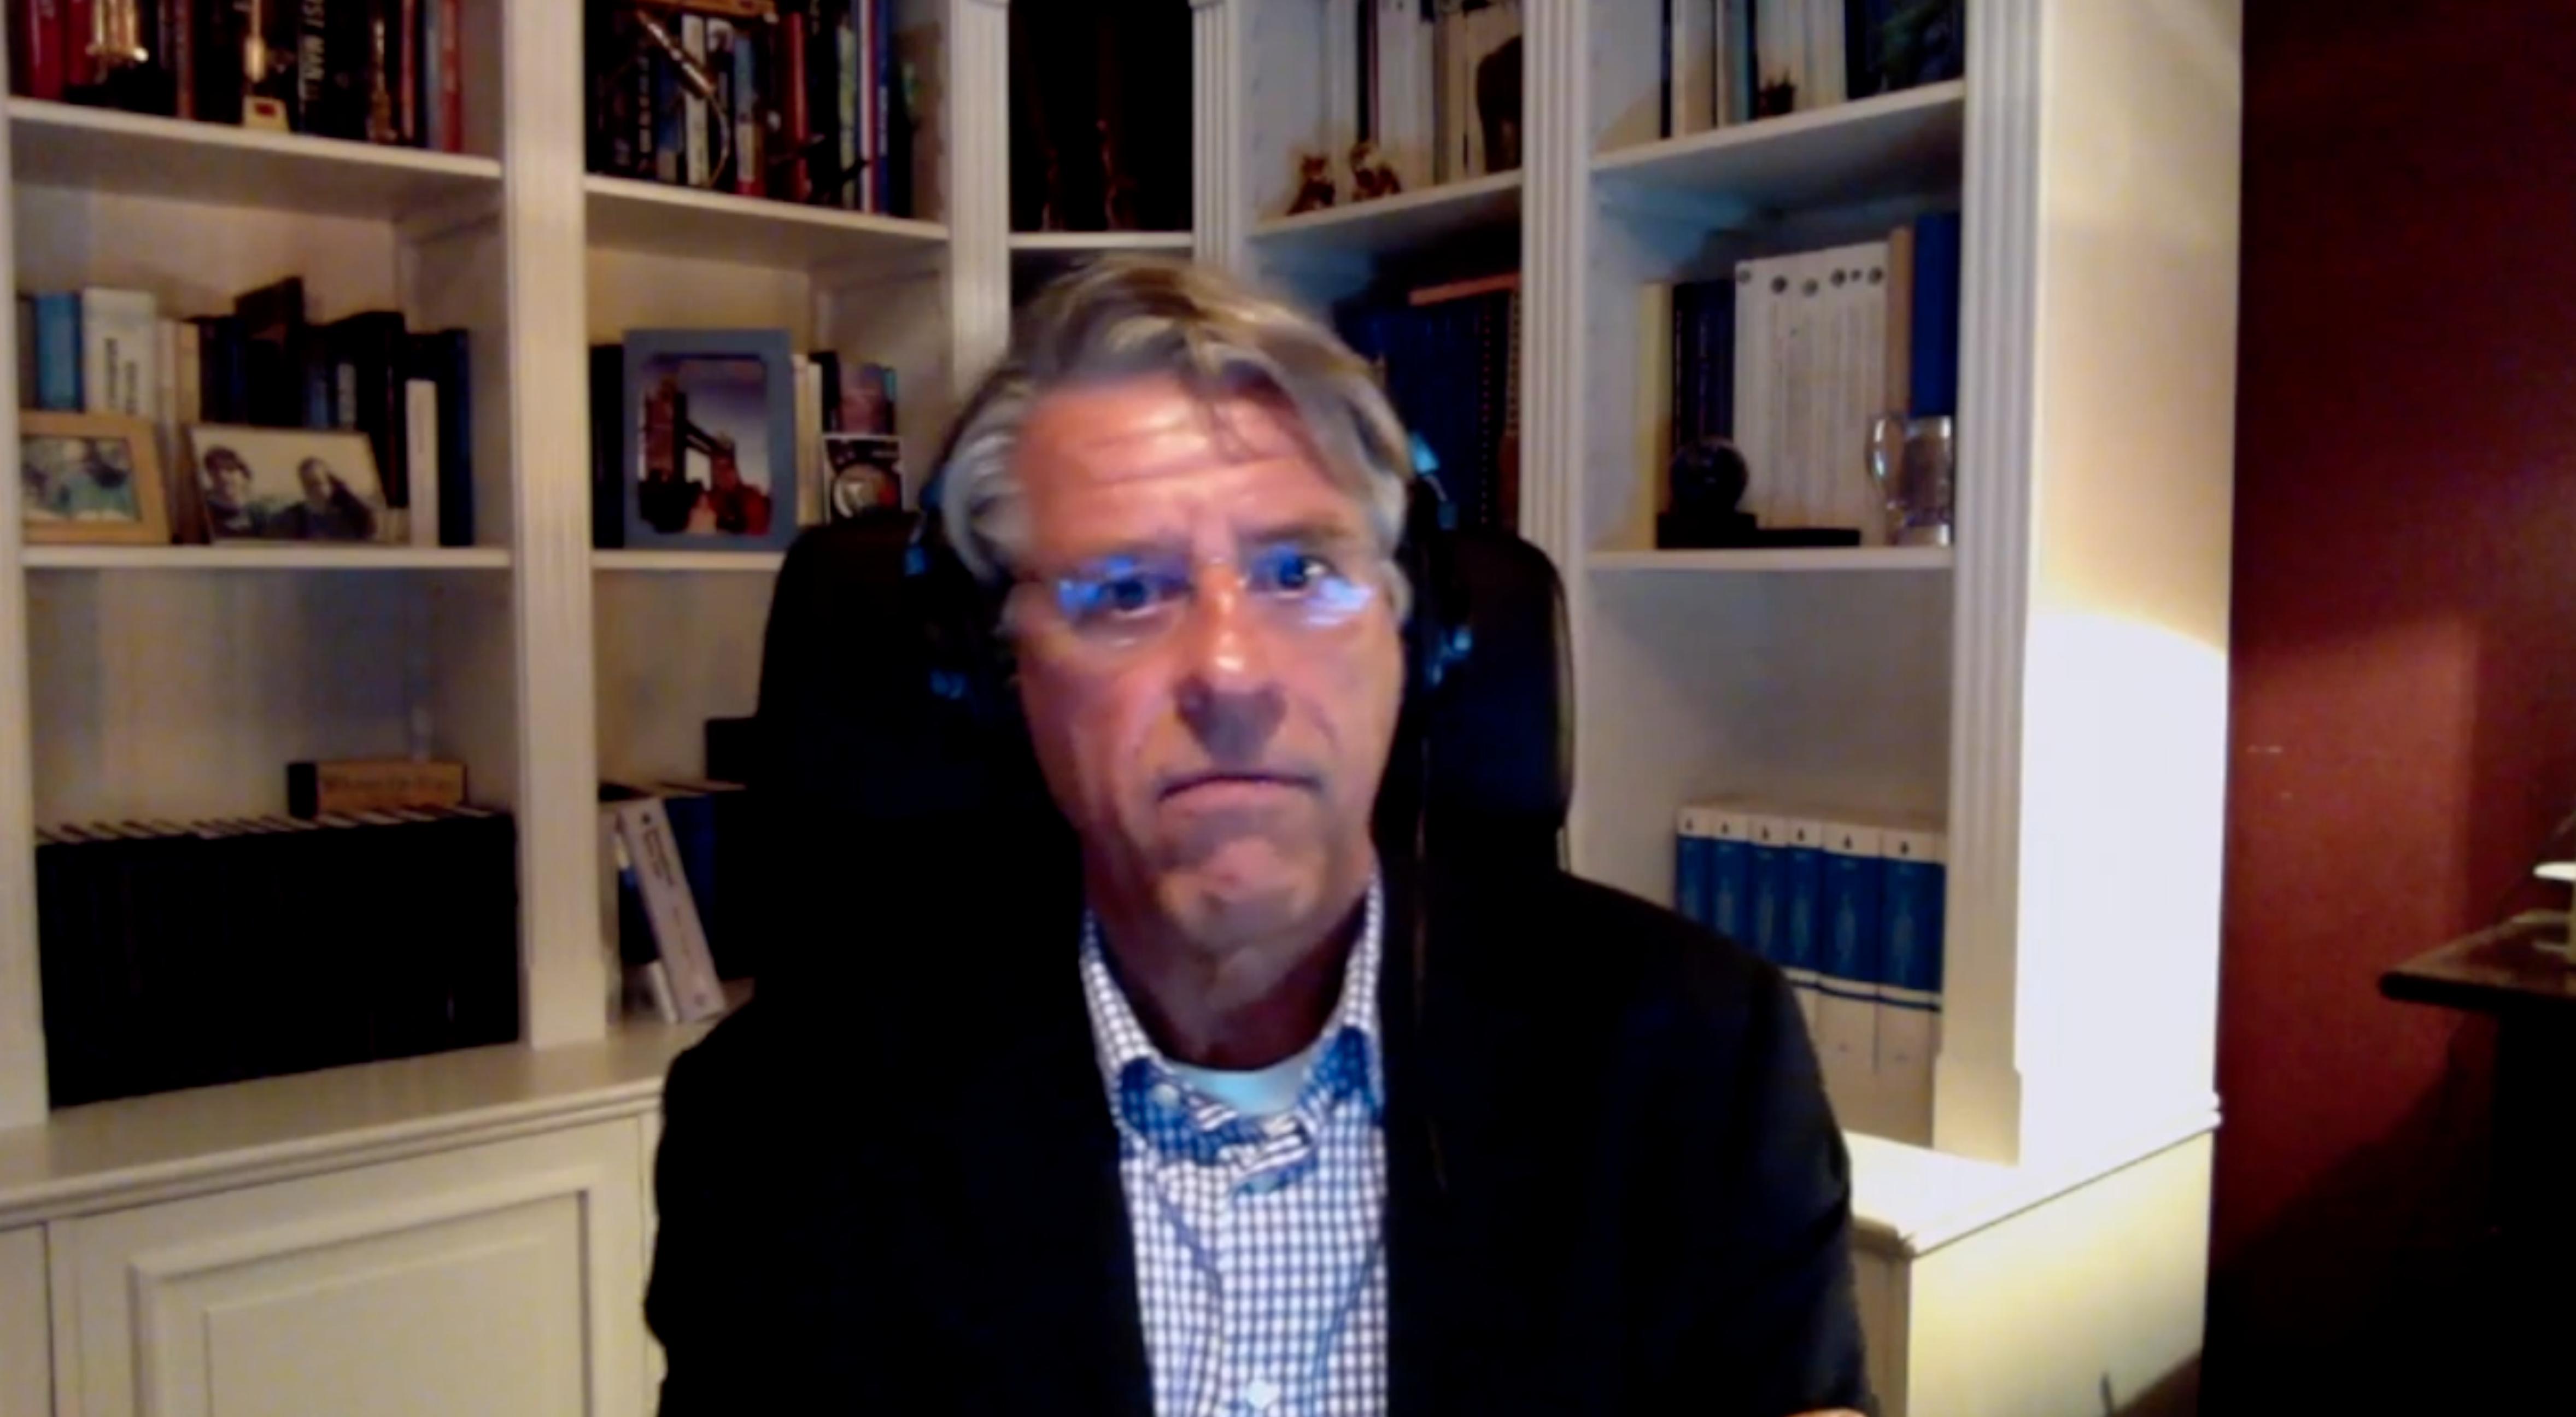 Professor von der Dunk sitting at his desk, shown via web conference.